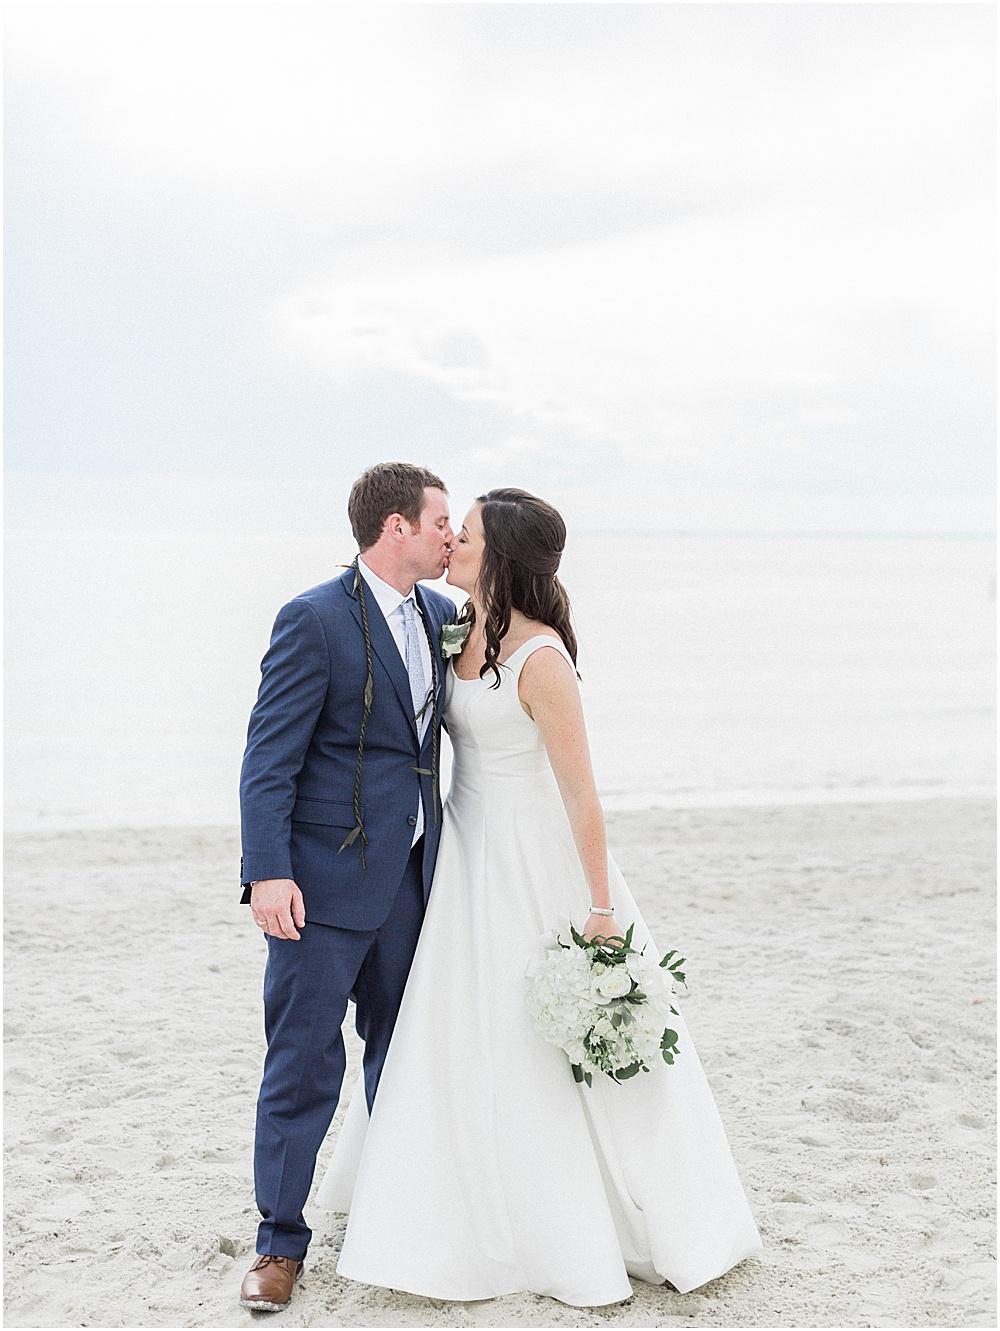 sea_crest_beach_club_st_anthonys_falmouth_old_silver_massachusetts_boston_wedding_photographer_meredith_jane_photography_photo_0418.jpg